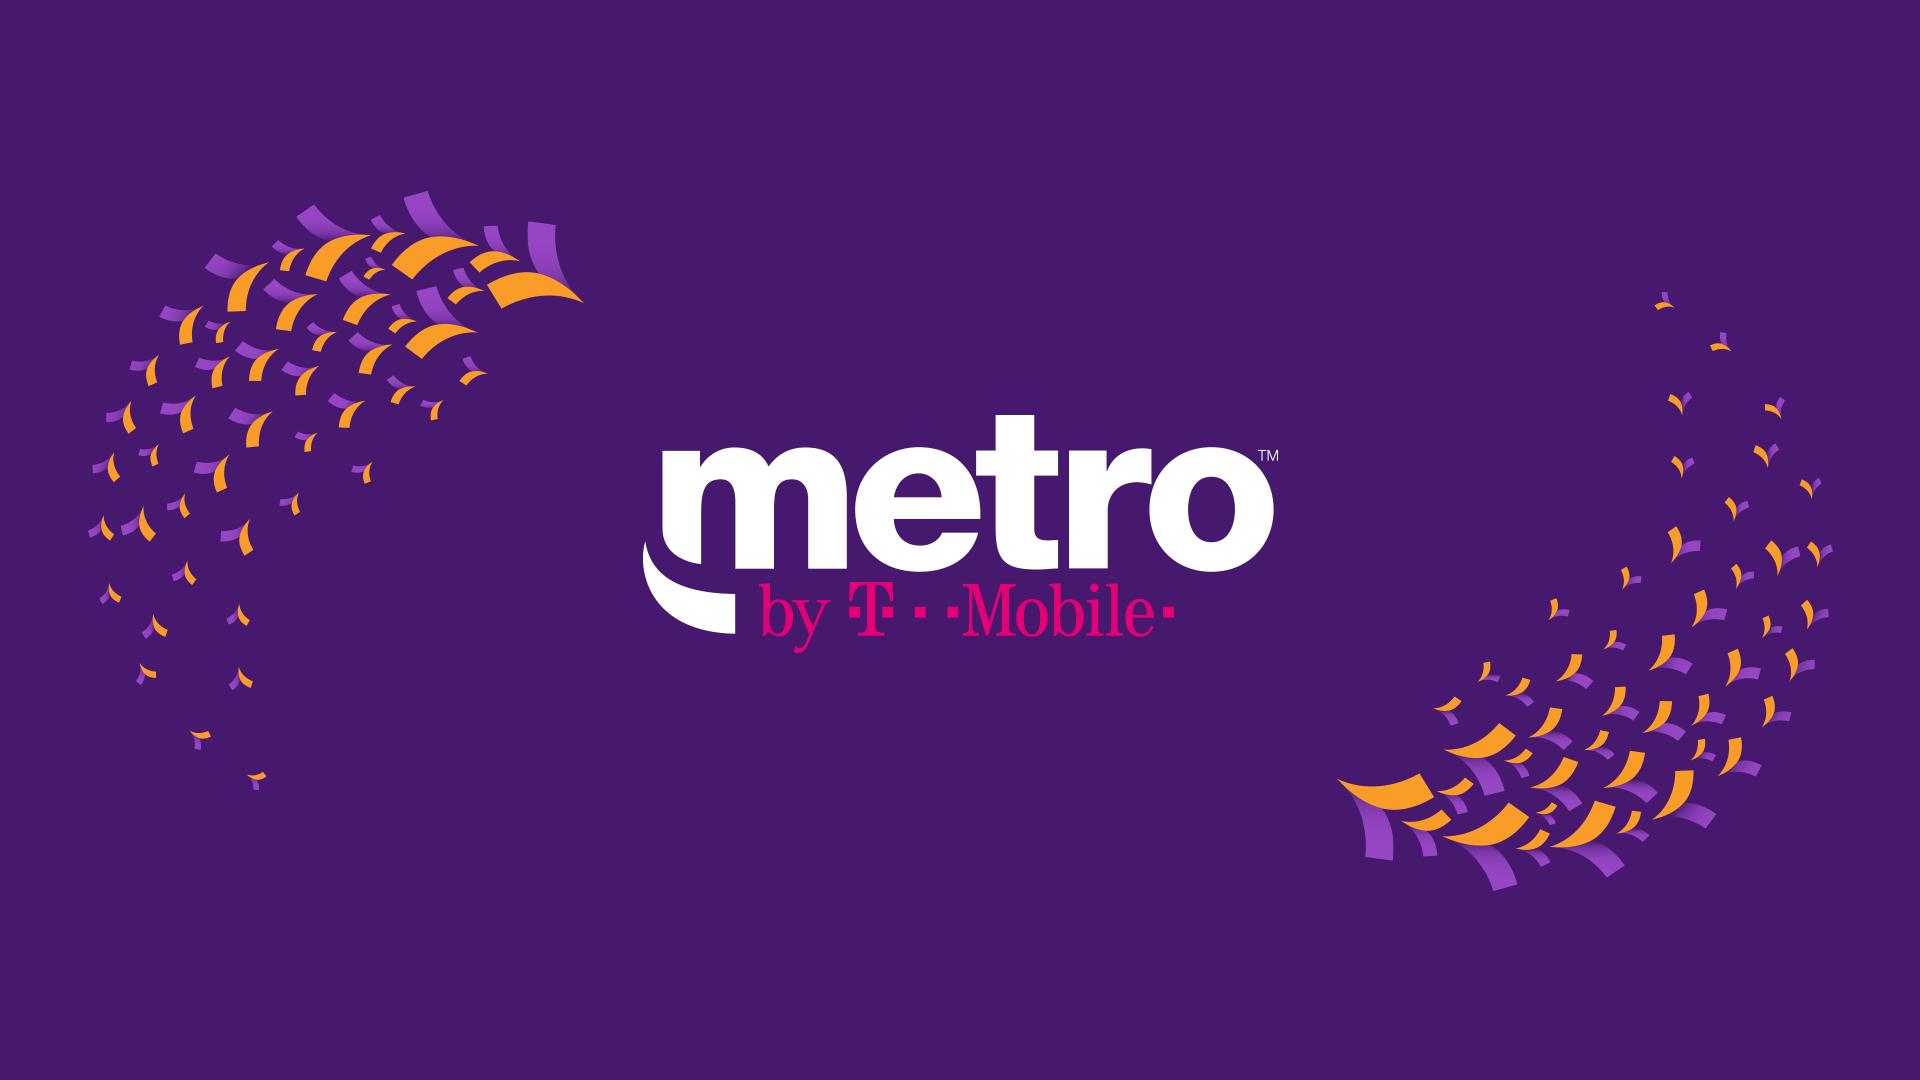 MetroPCS Chattanooga